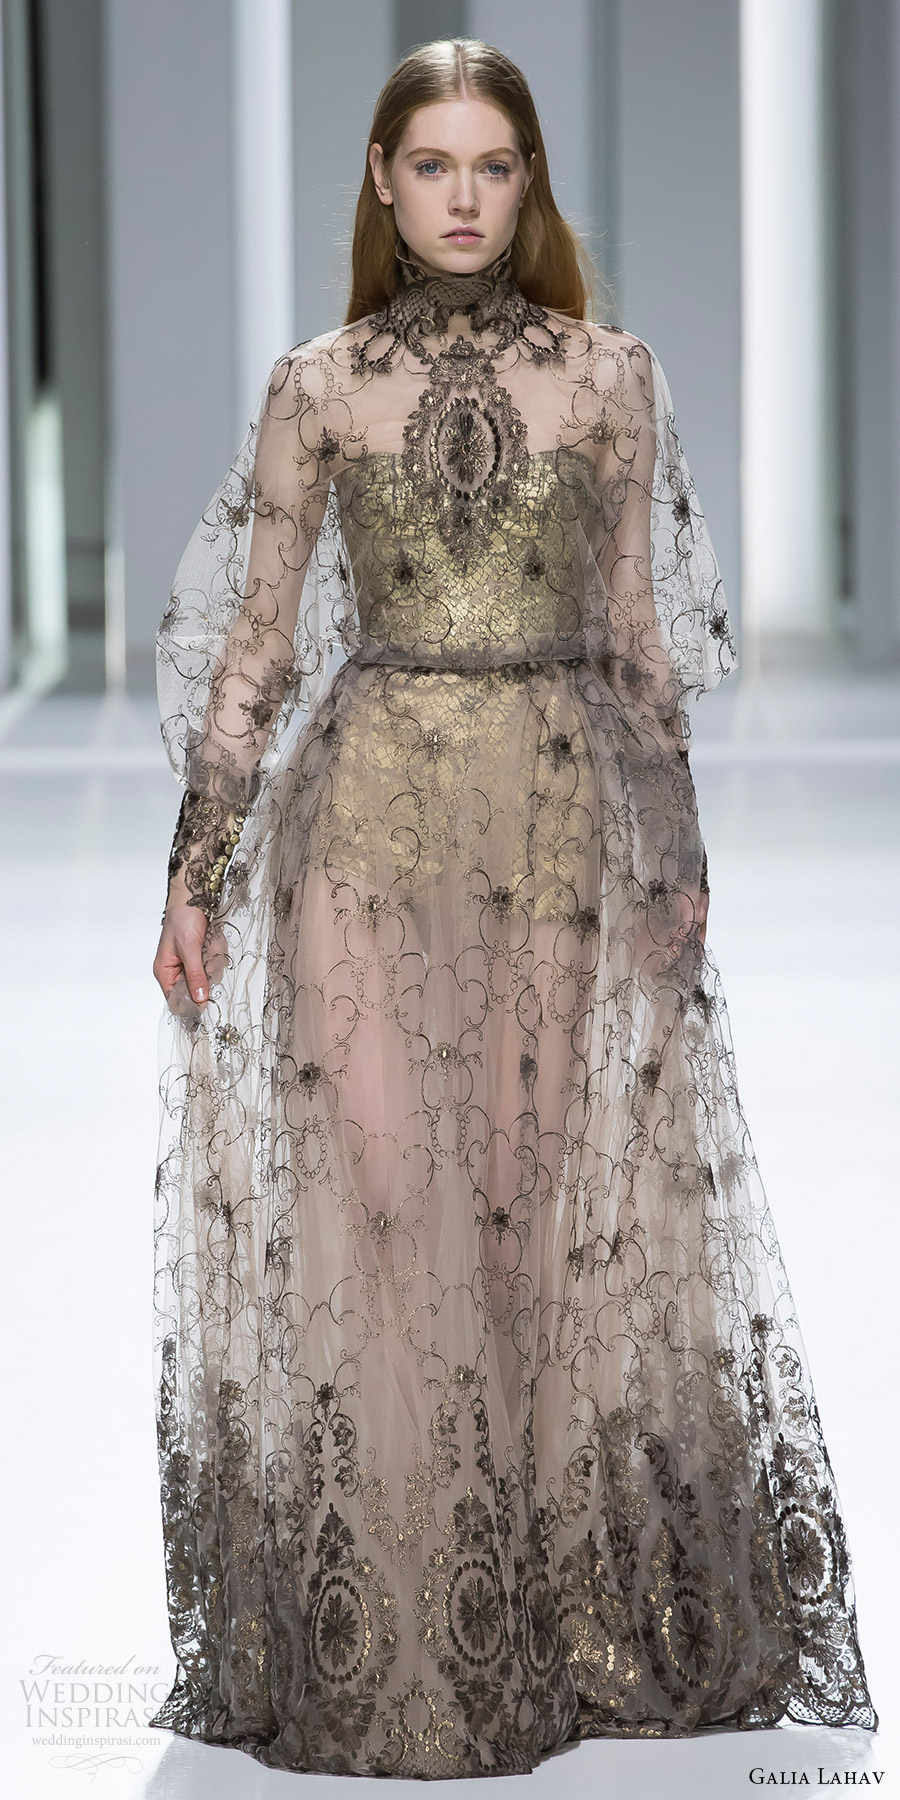 galia lahav haute couture spring 2017 (shailene) gown